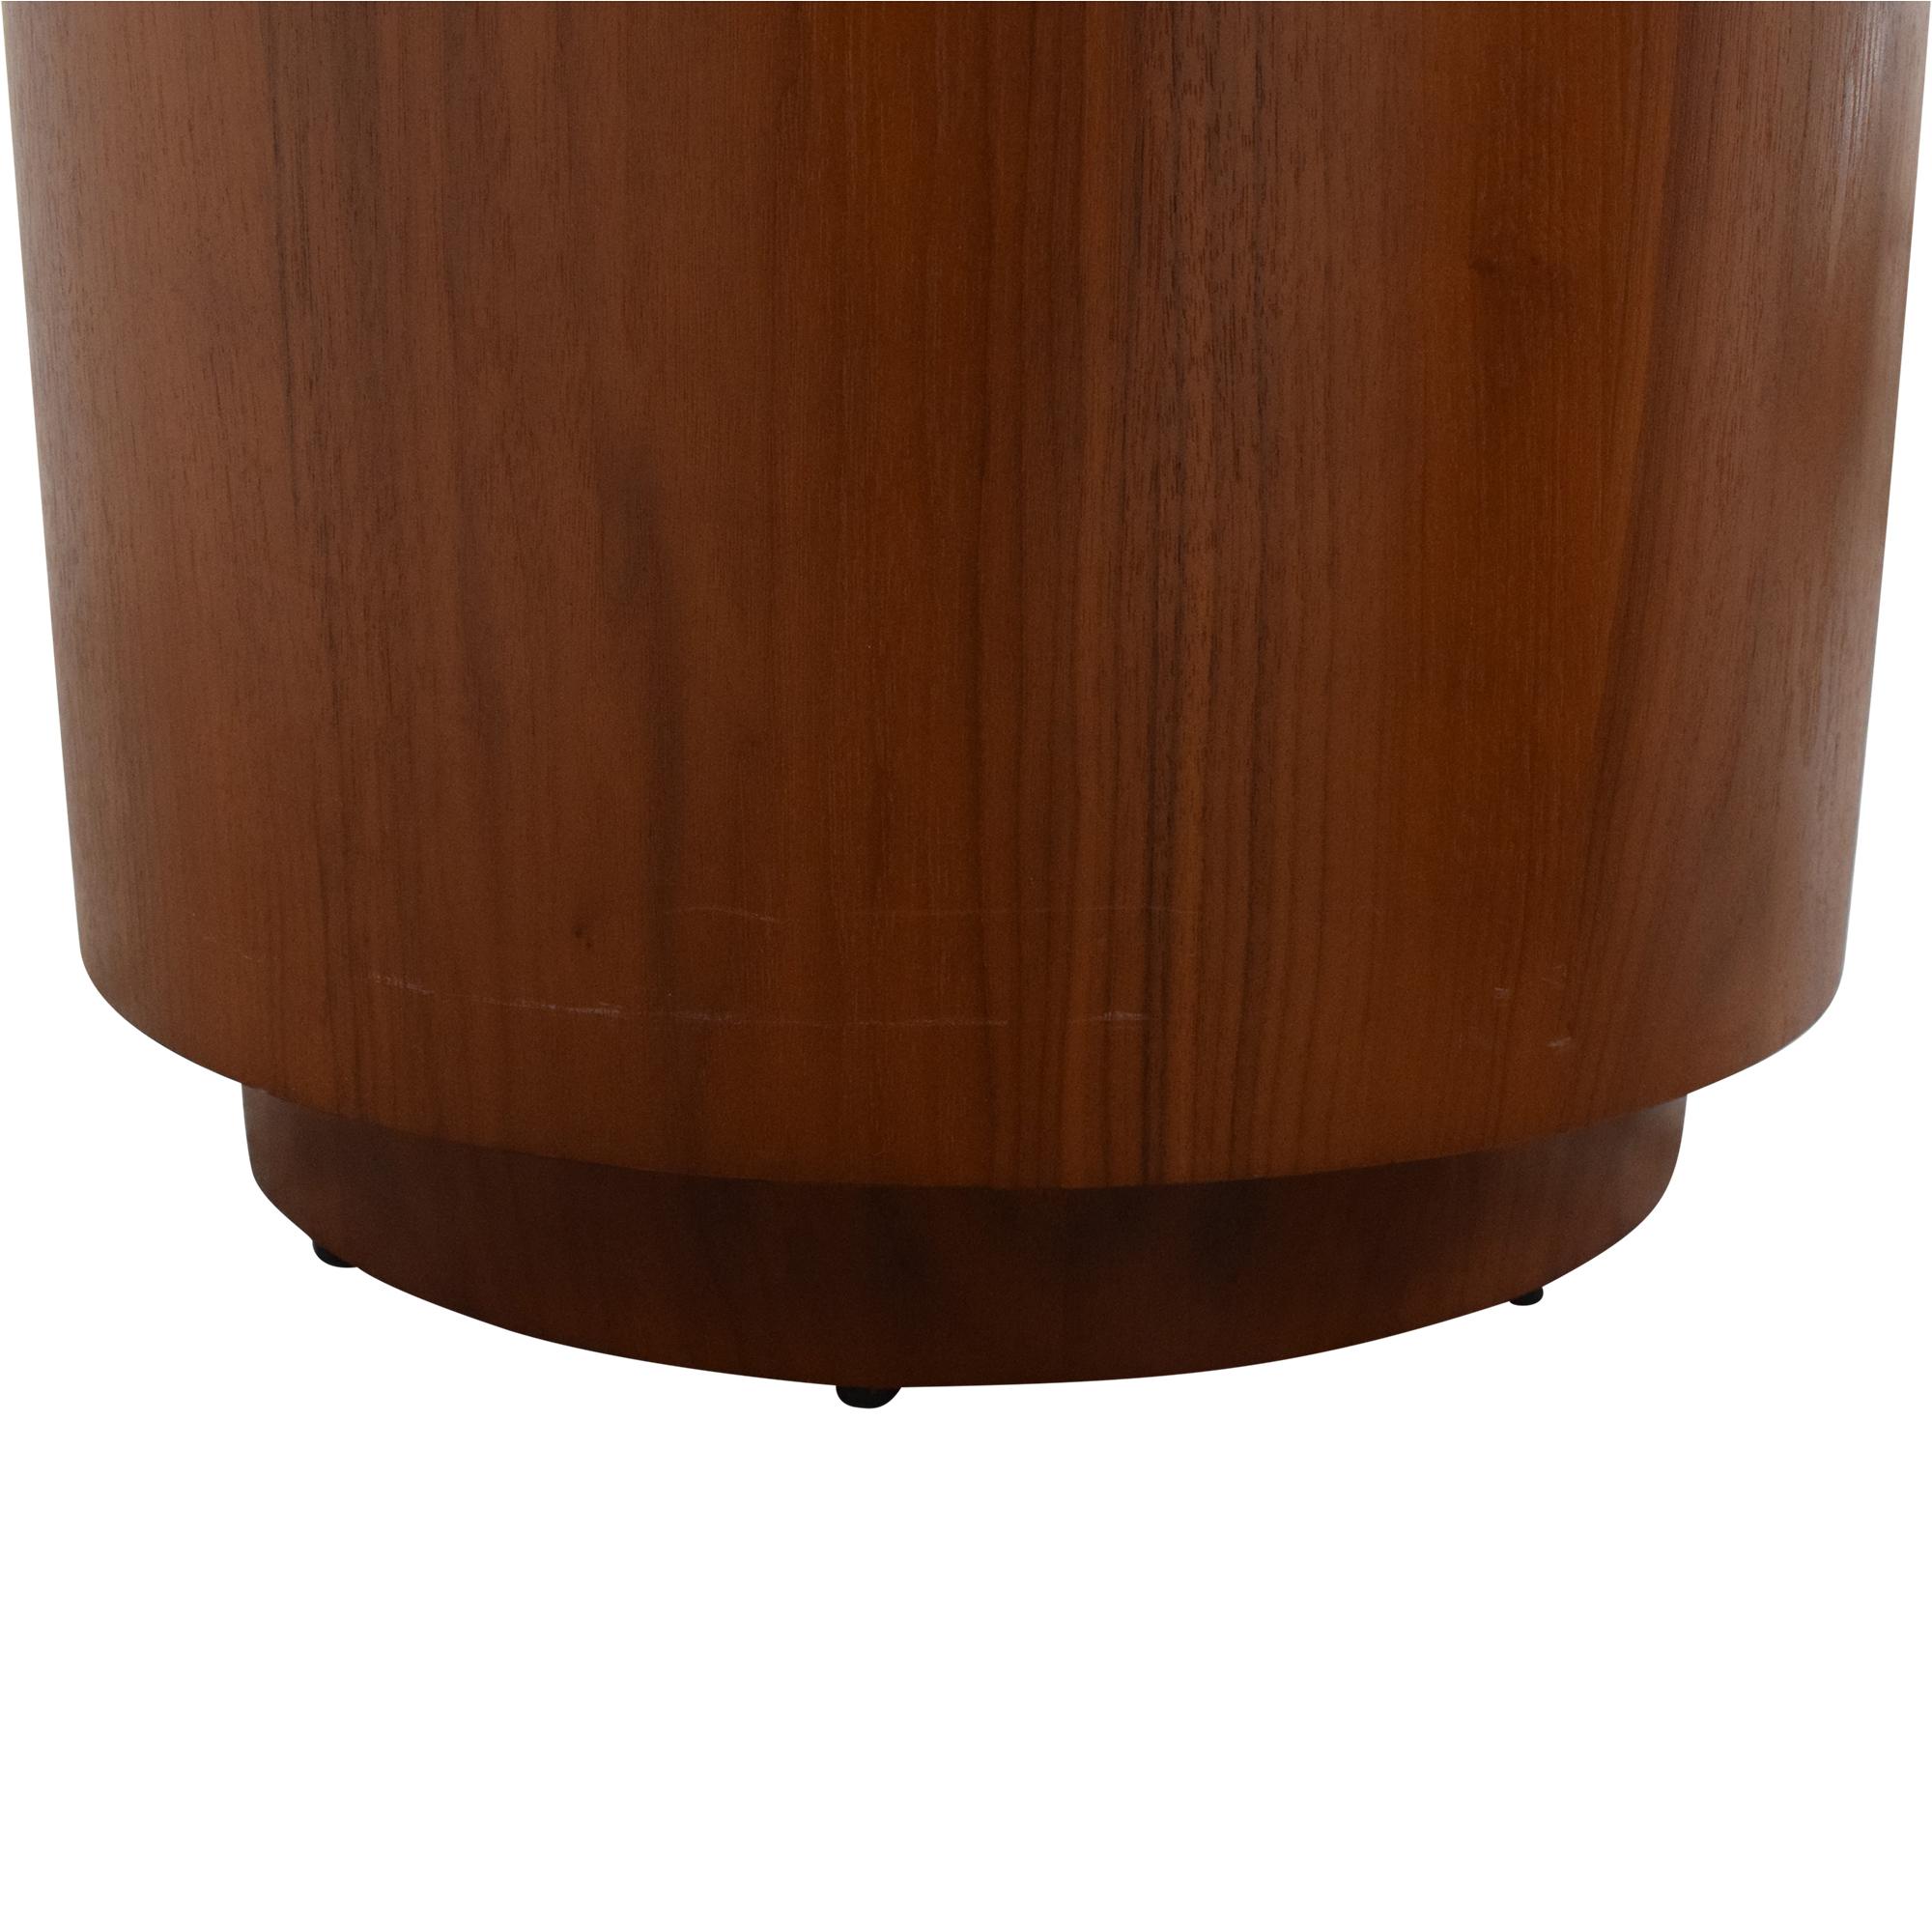 Crate & Barrel Crate & Barrel Tambe End Tables brown